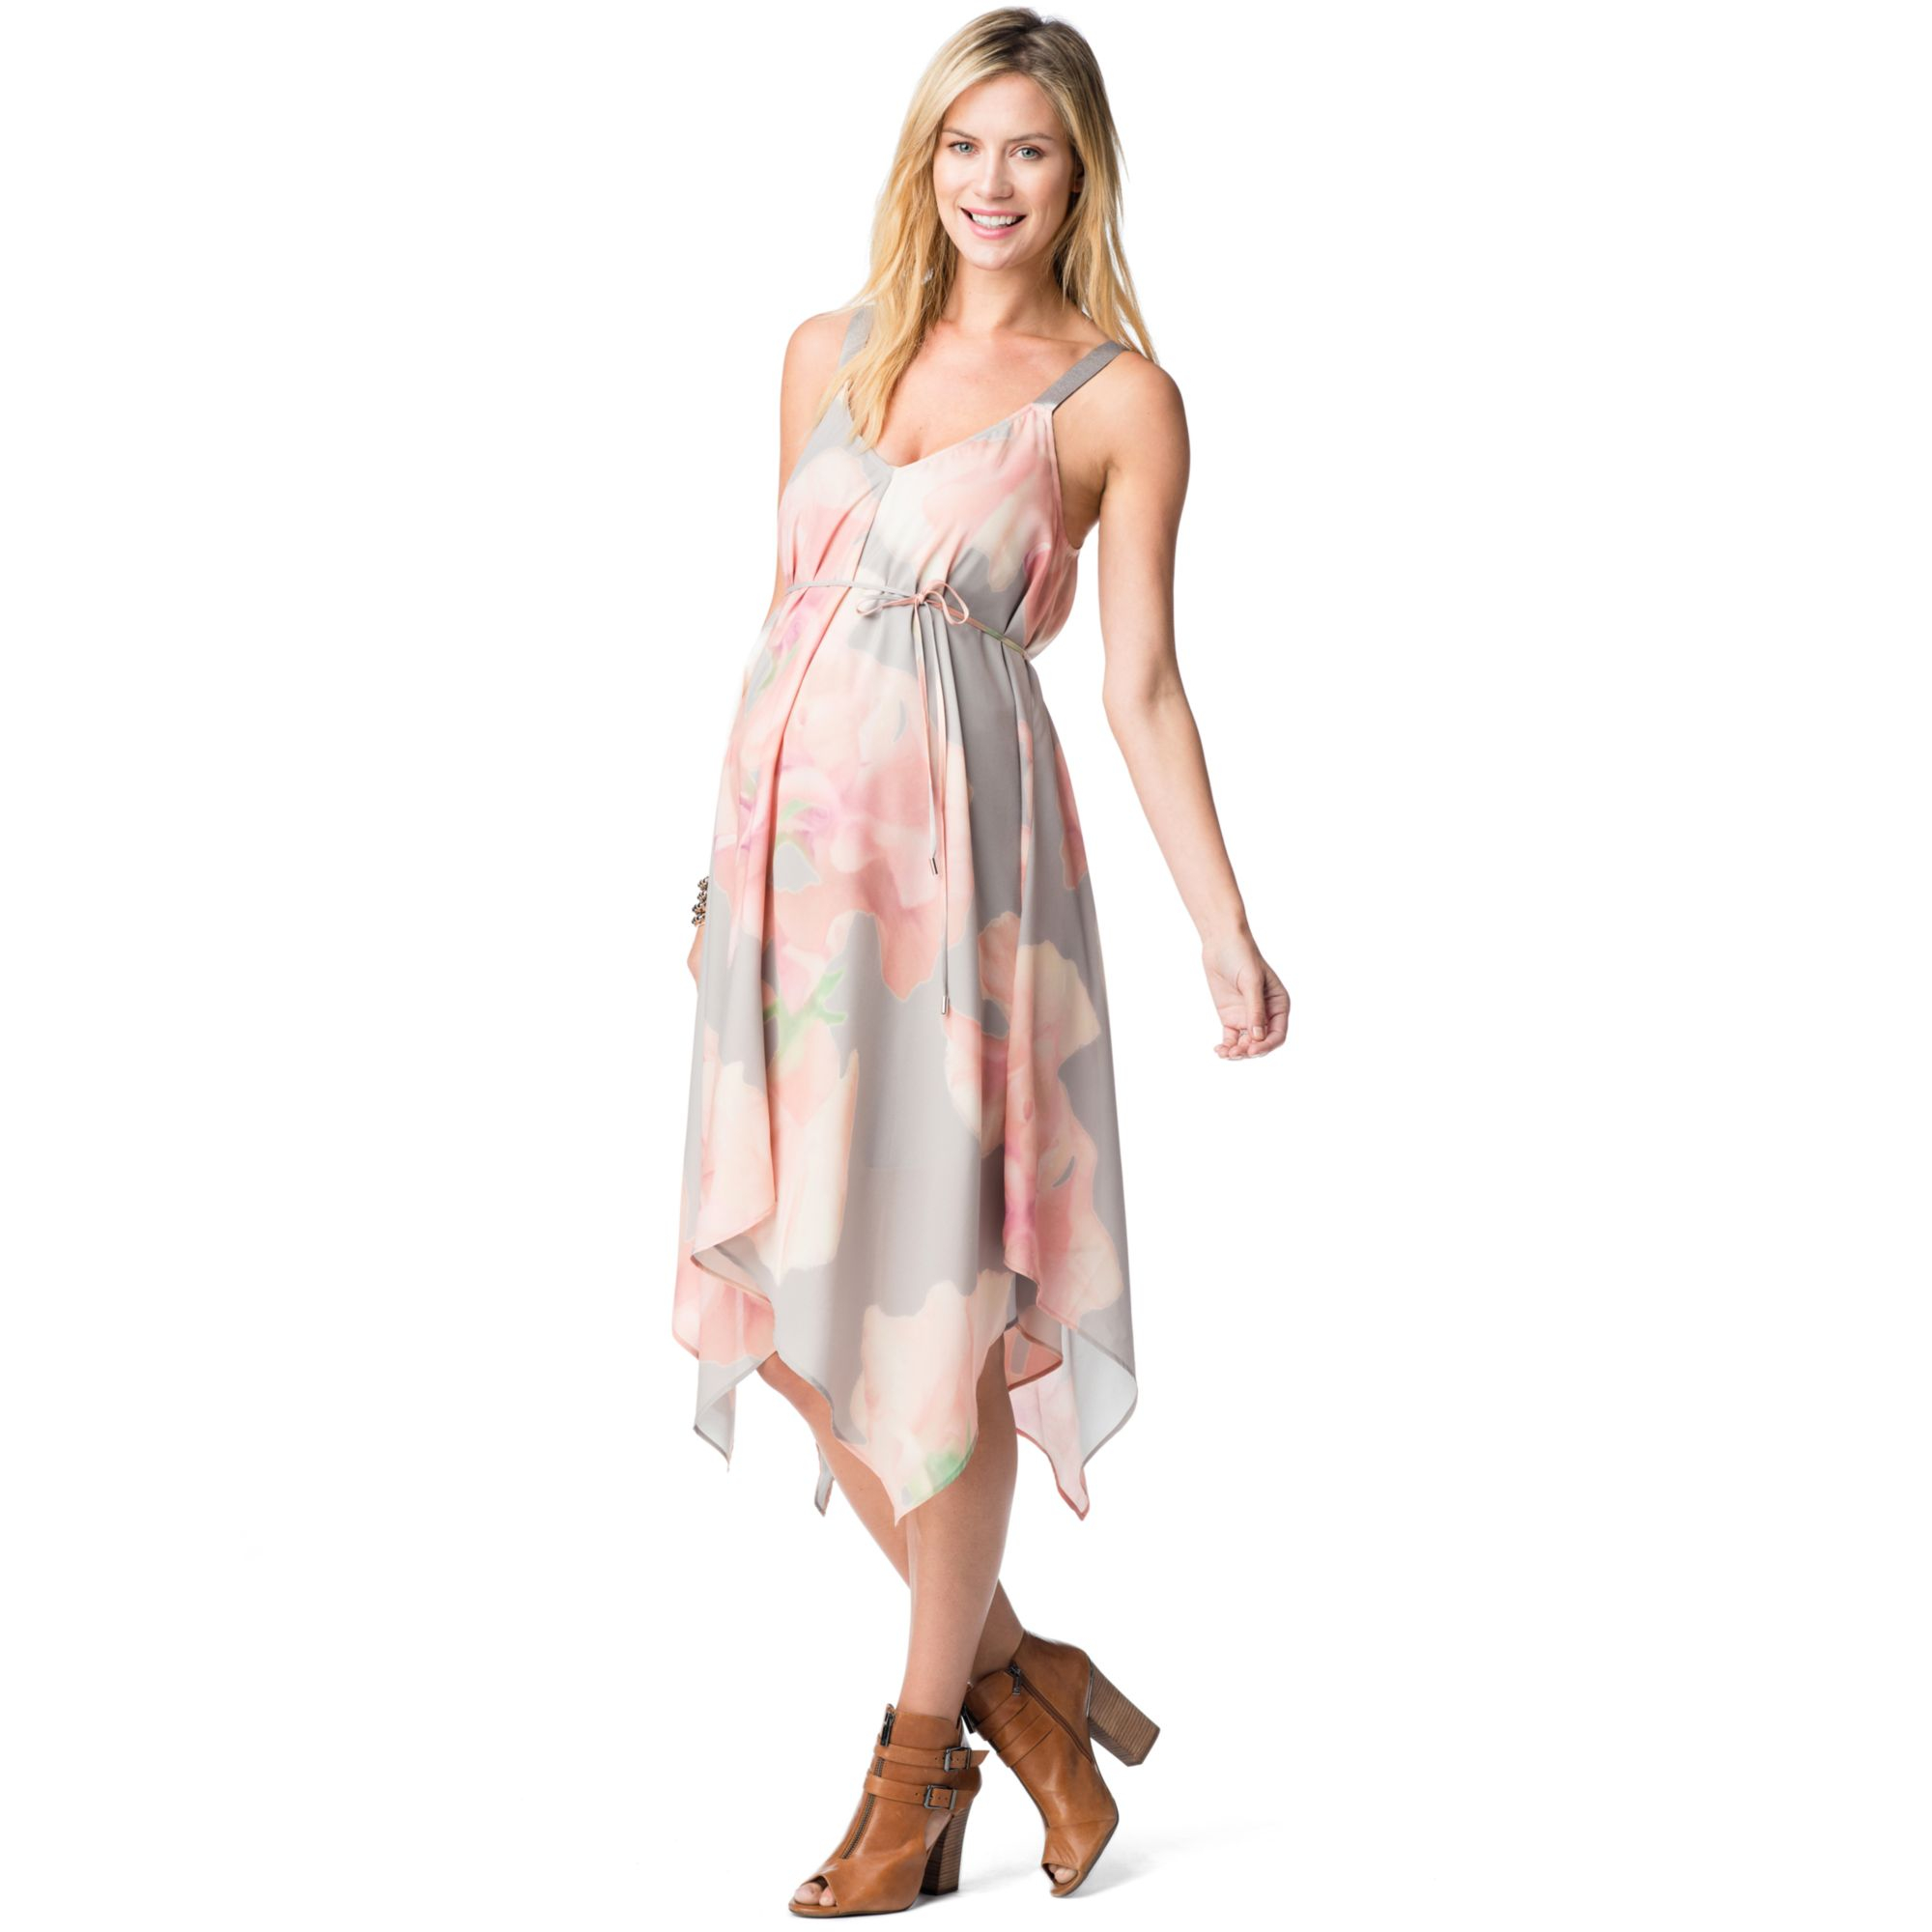 0eec3fcefd2d5 Jessica Simpson Maternity Floralprint Handkerchiefhem Dress in Pink ...